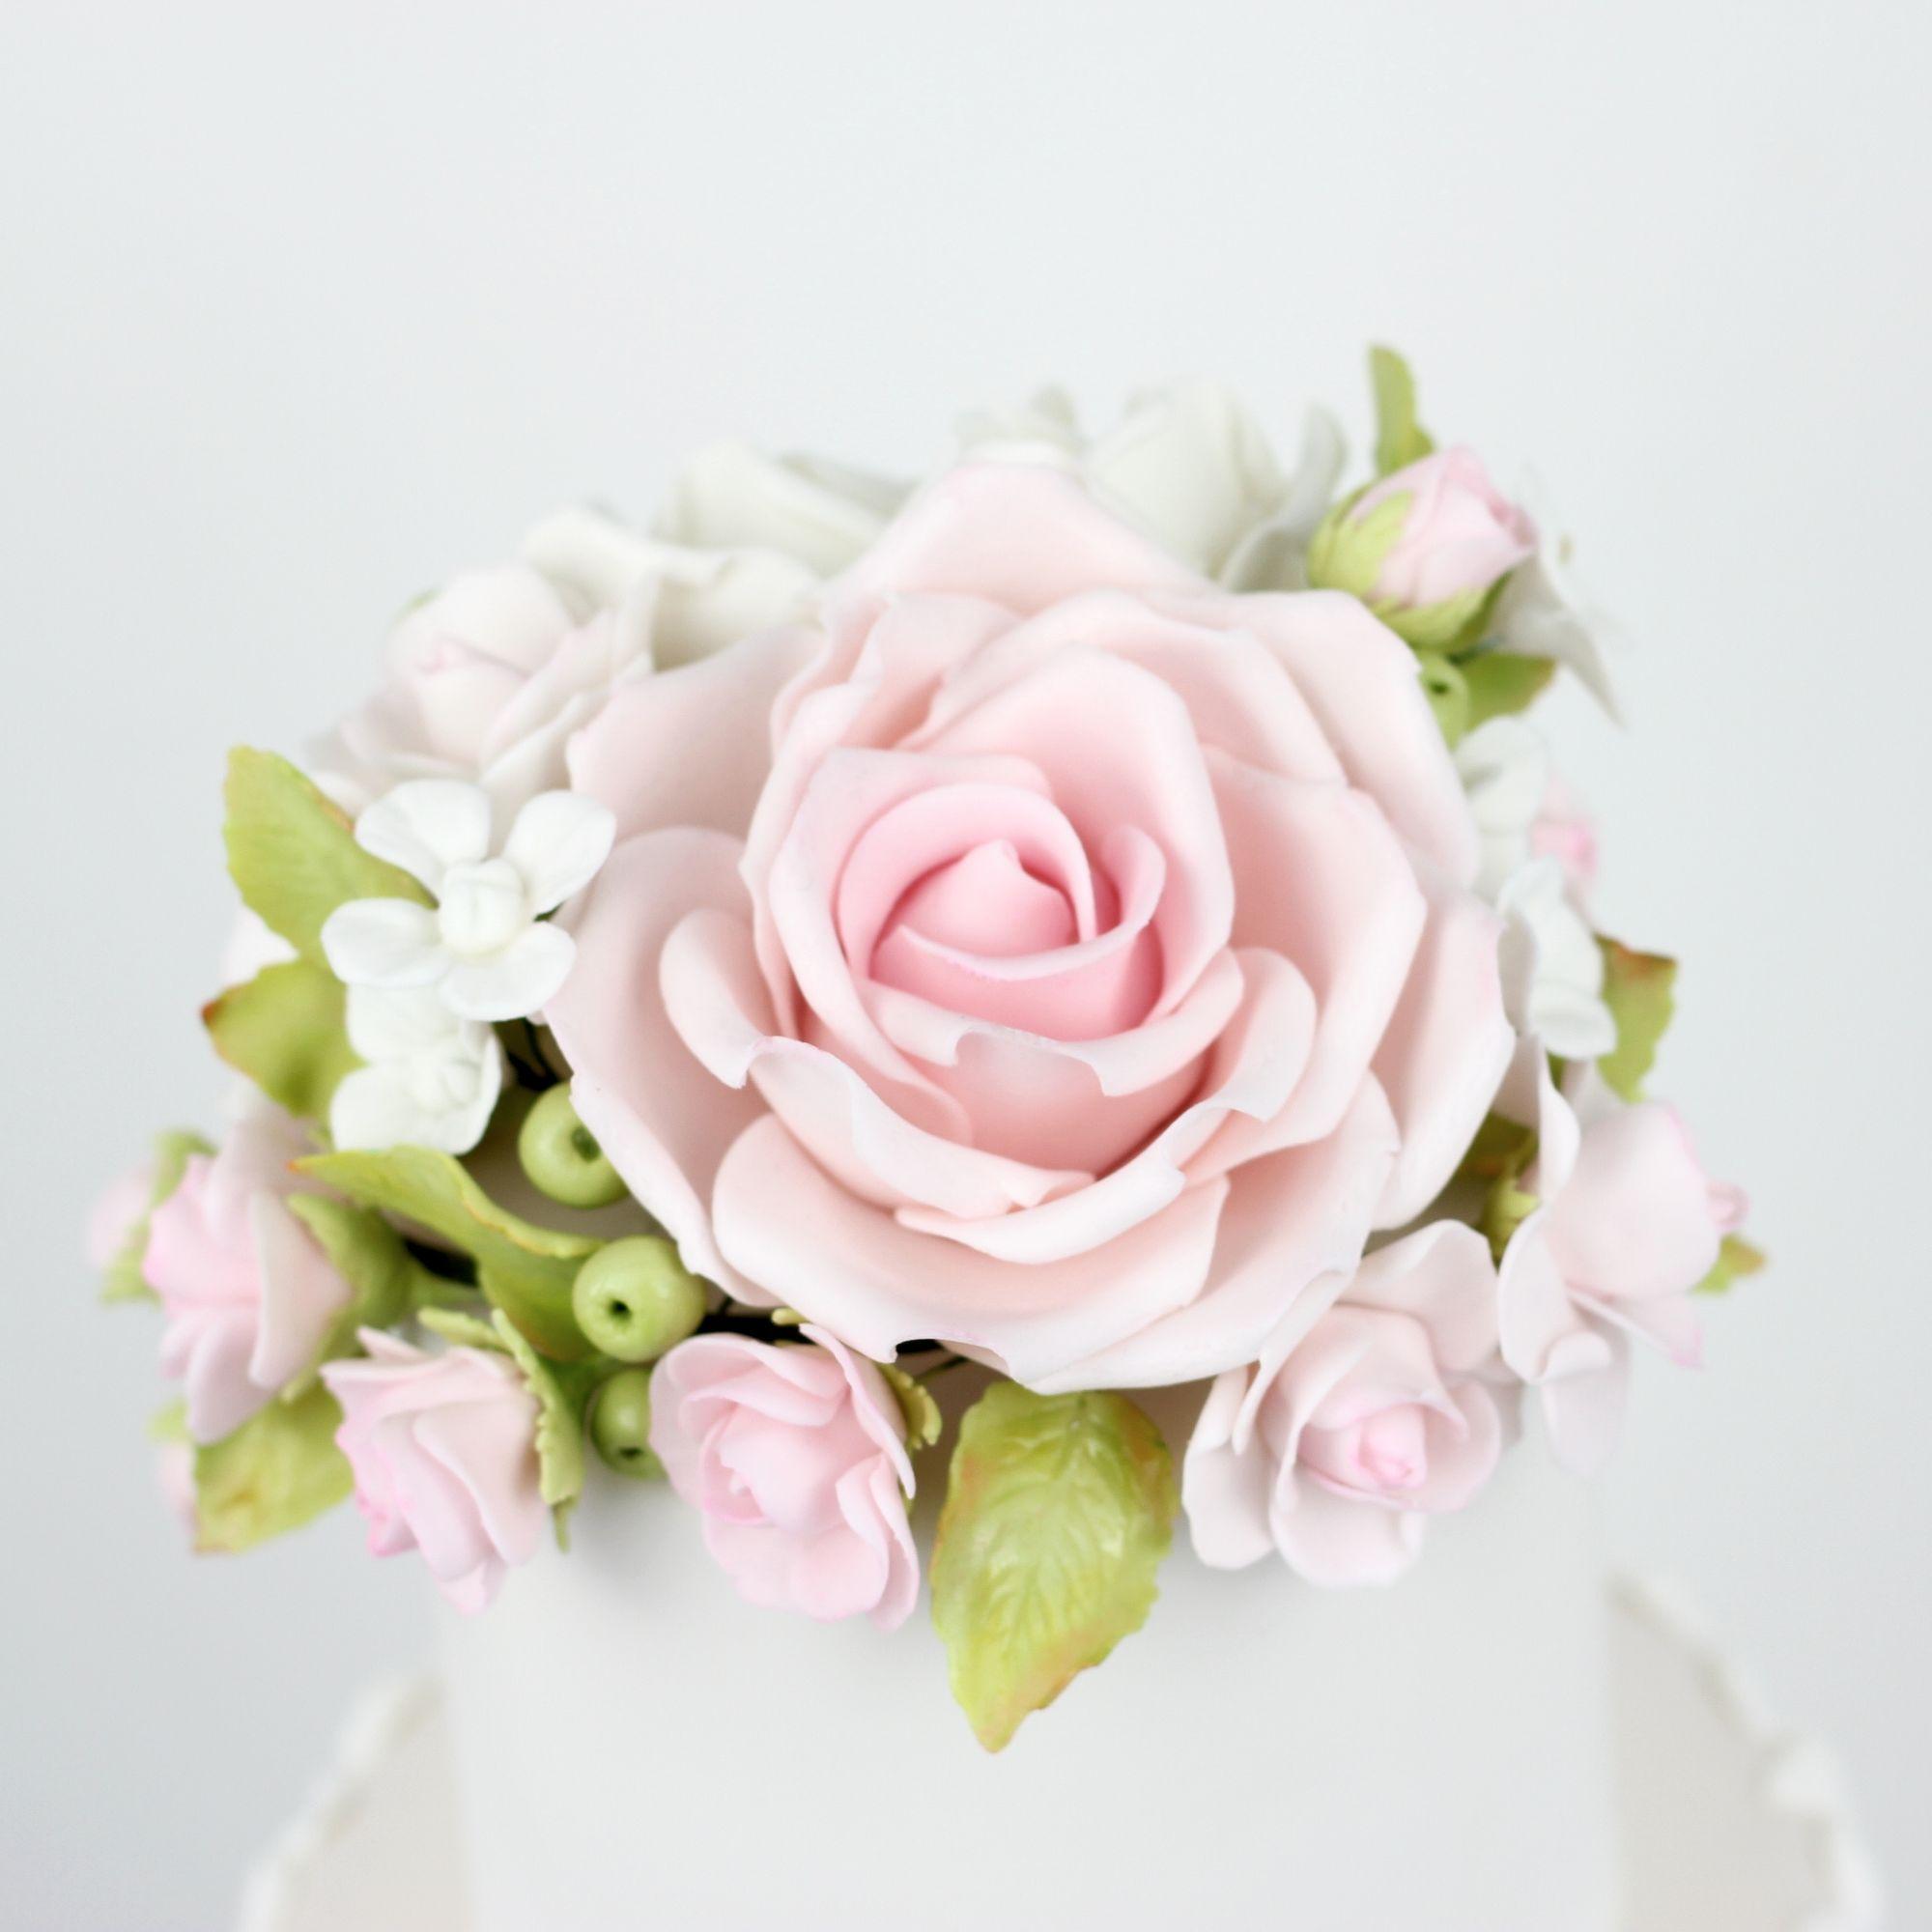 Pink rose, hydrangeas and berries.